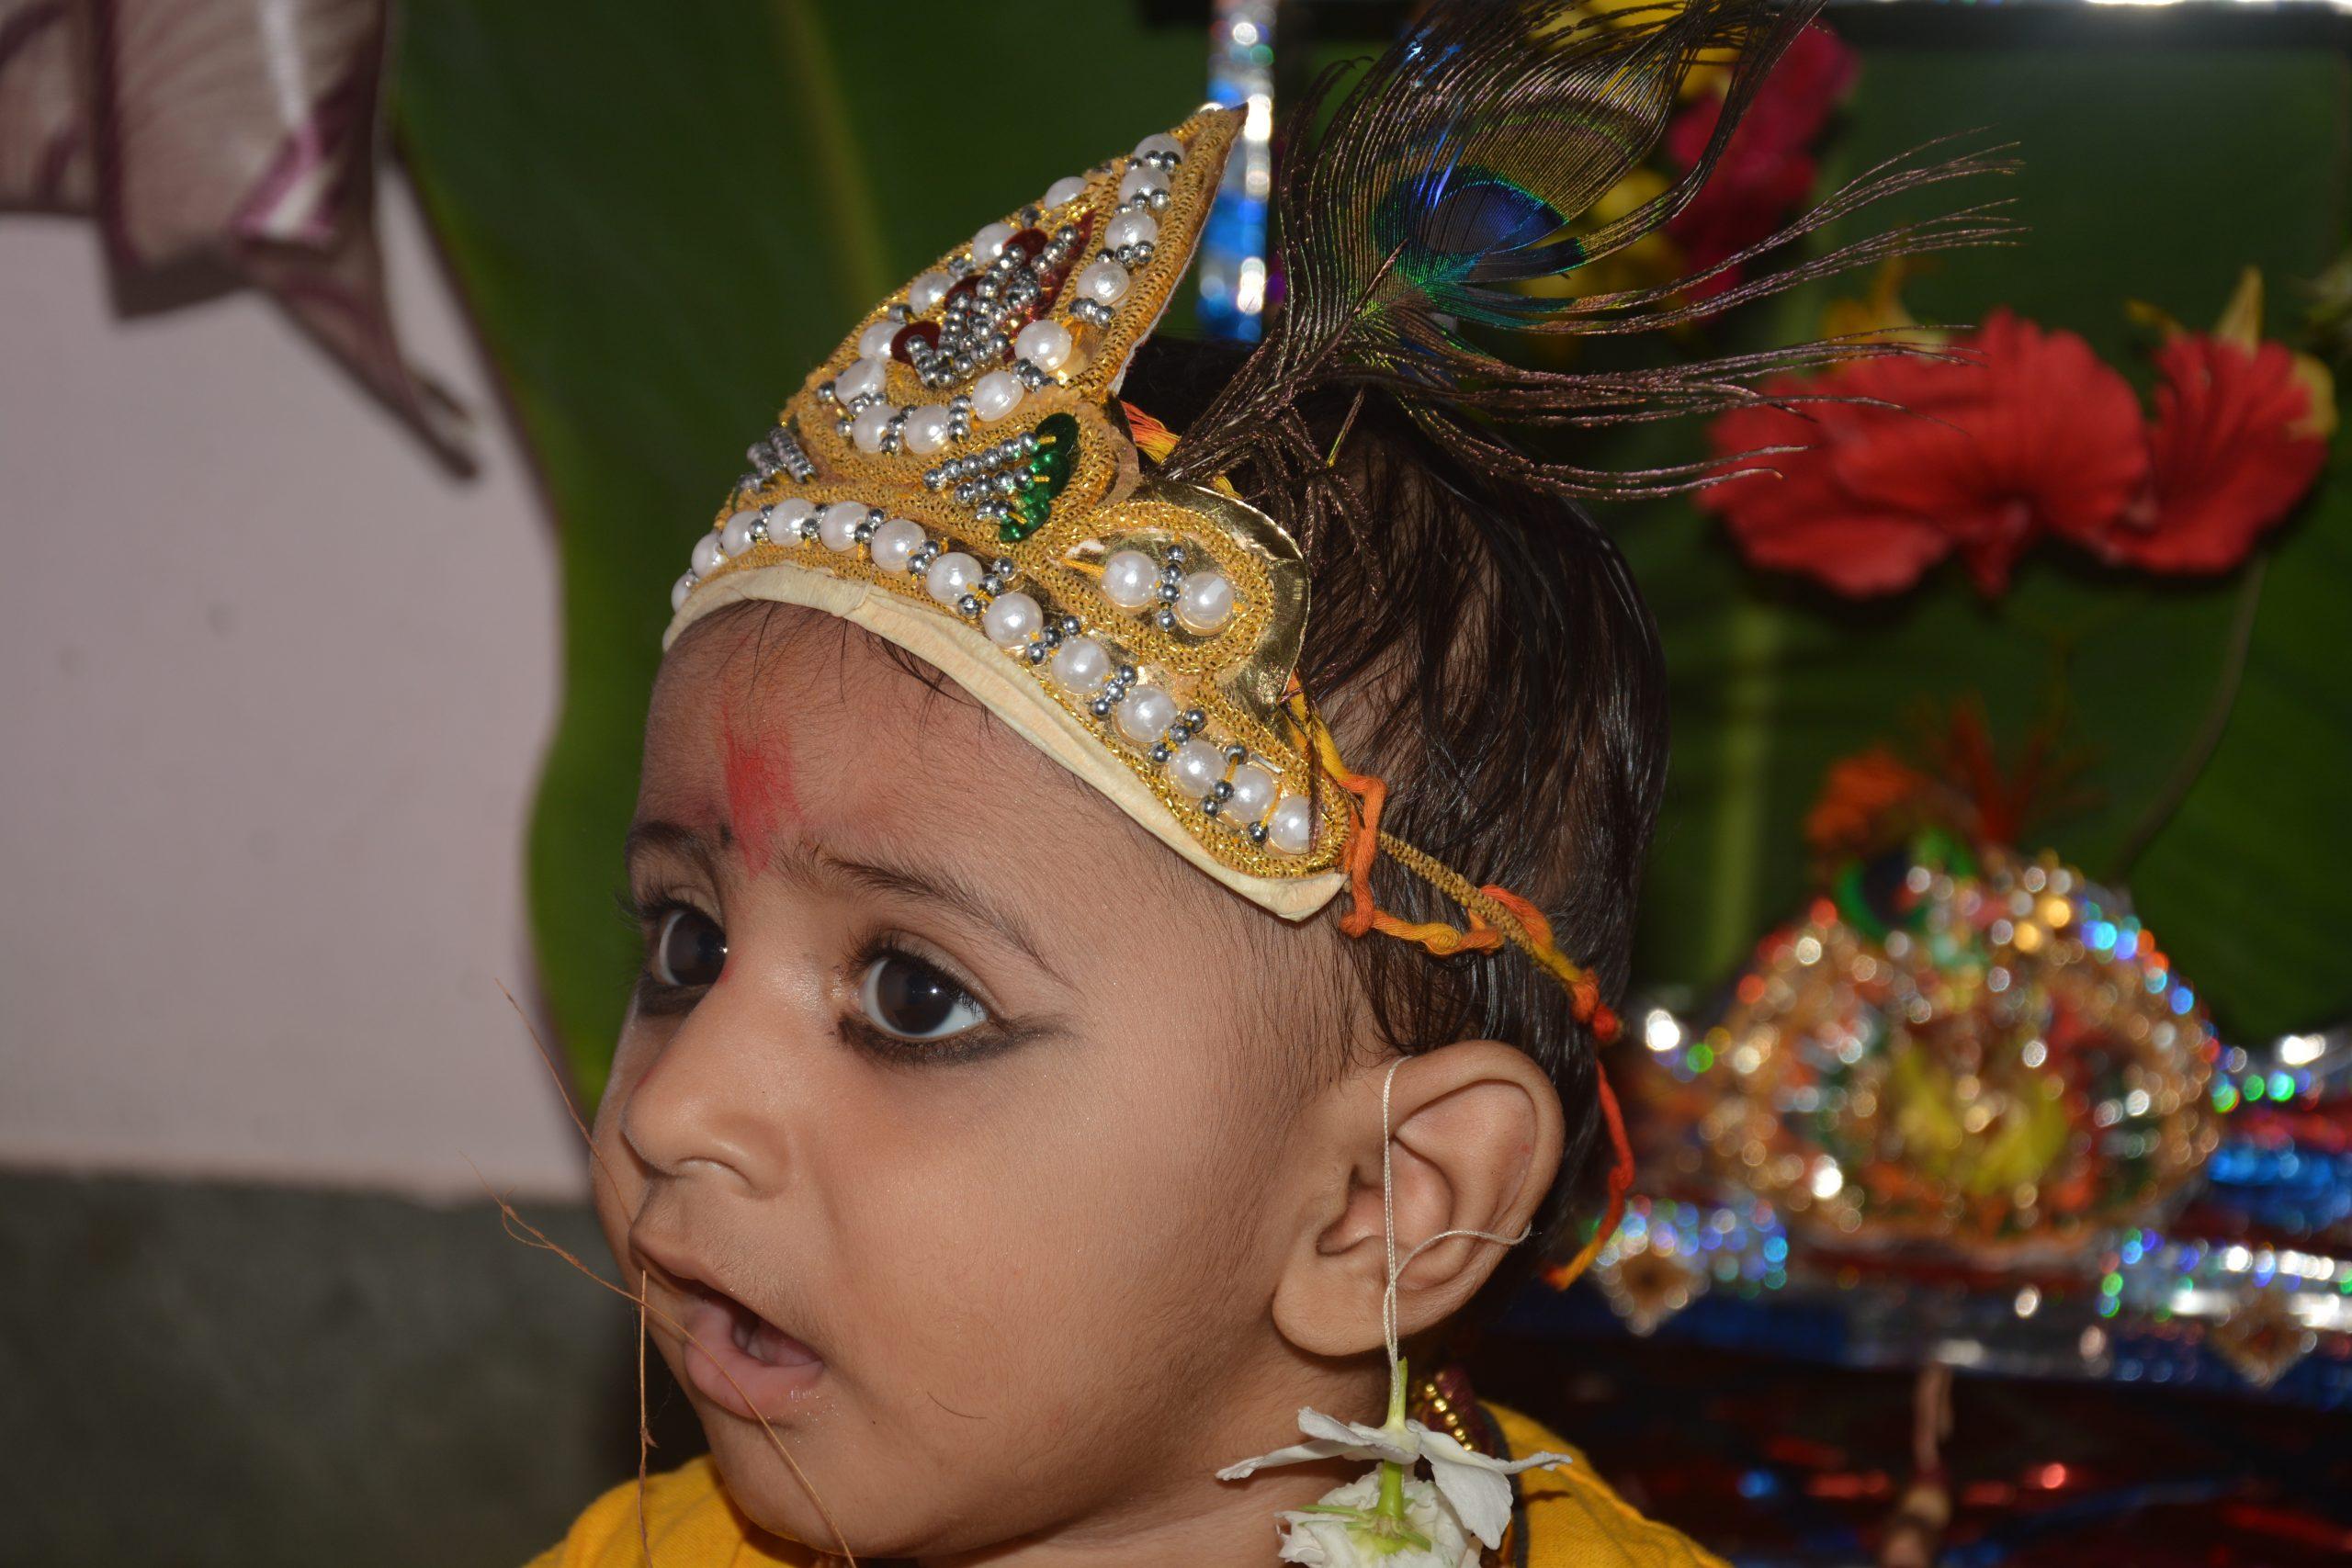 A kid in Krishna makeover